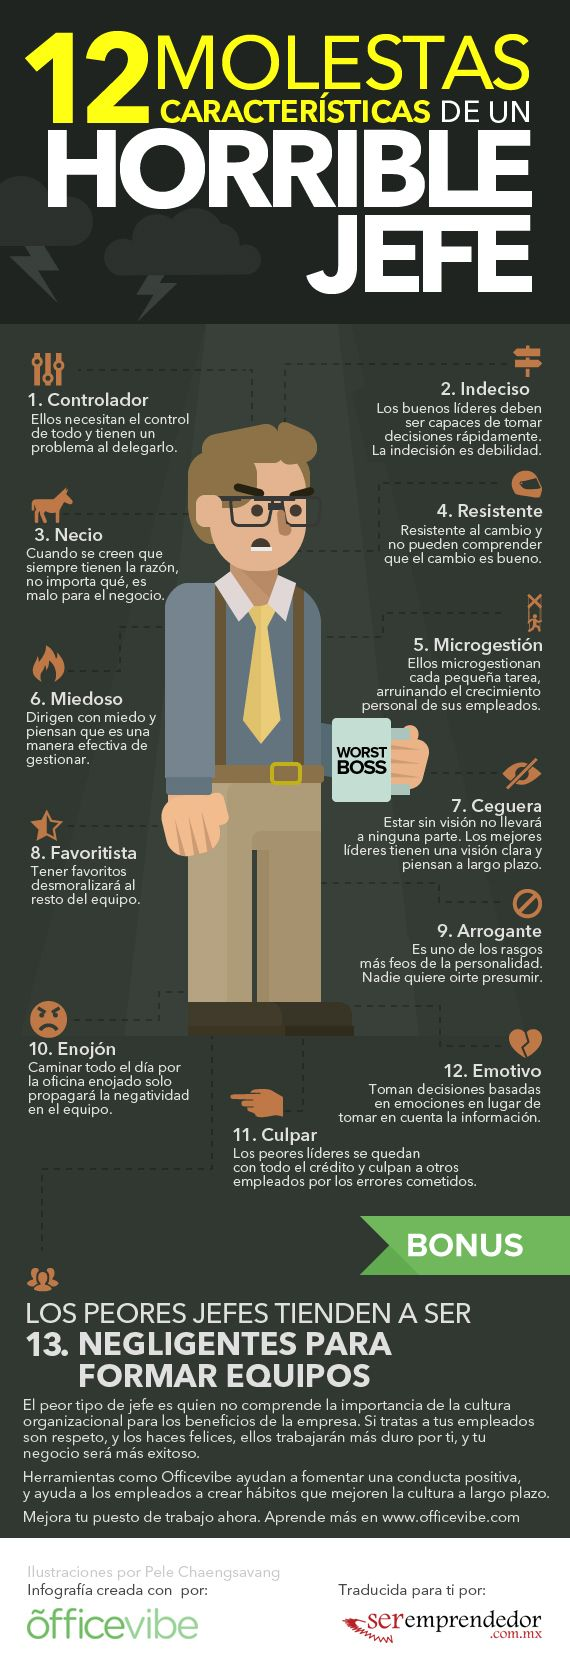 12 características de un mal jefe #infografia #infographic #rrhh